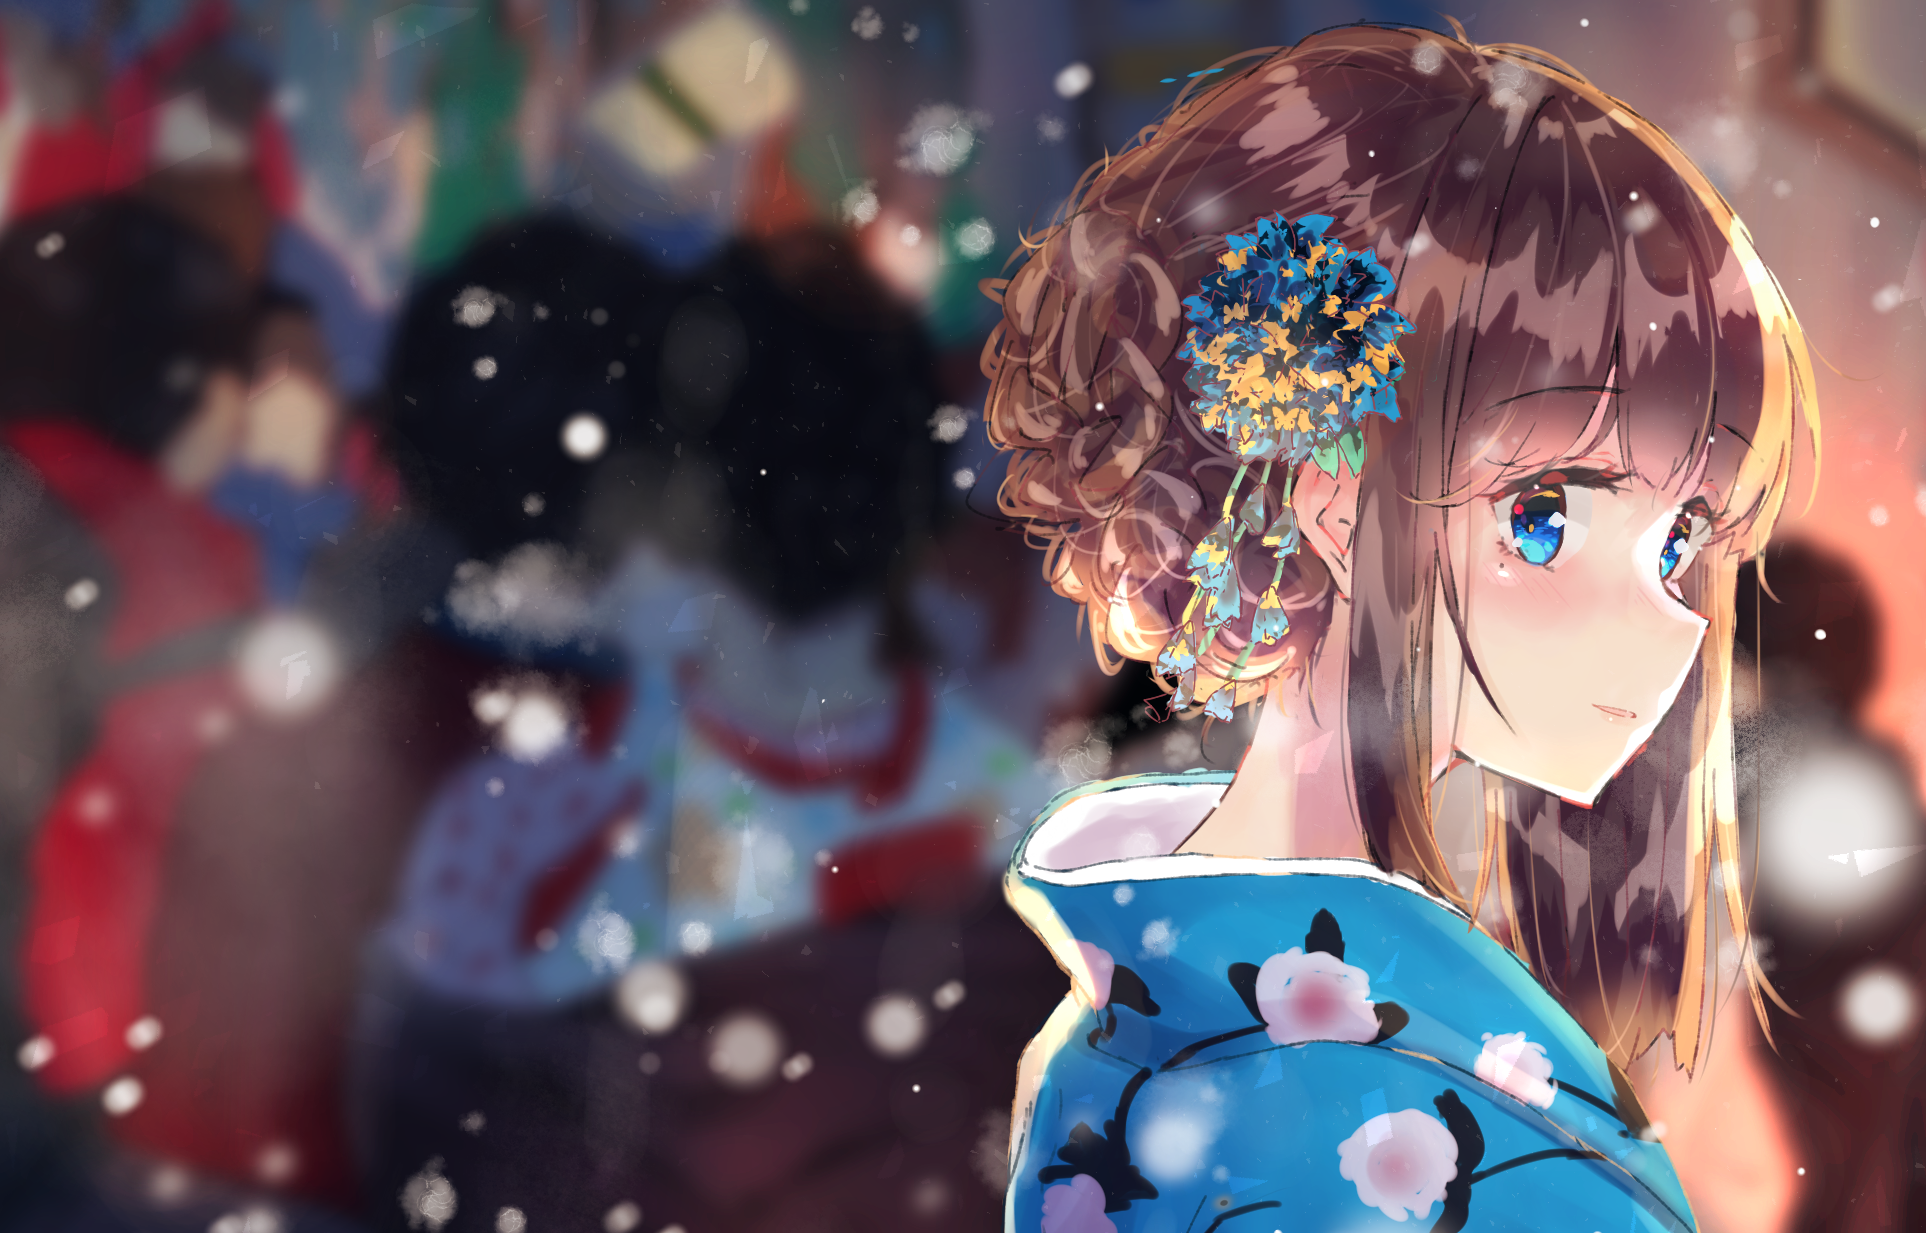 Kimono HD Wallpaper   Hintergrund   18x18